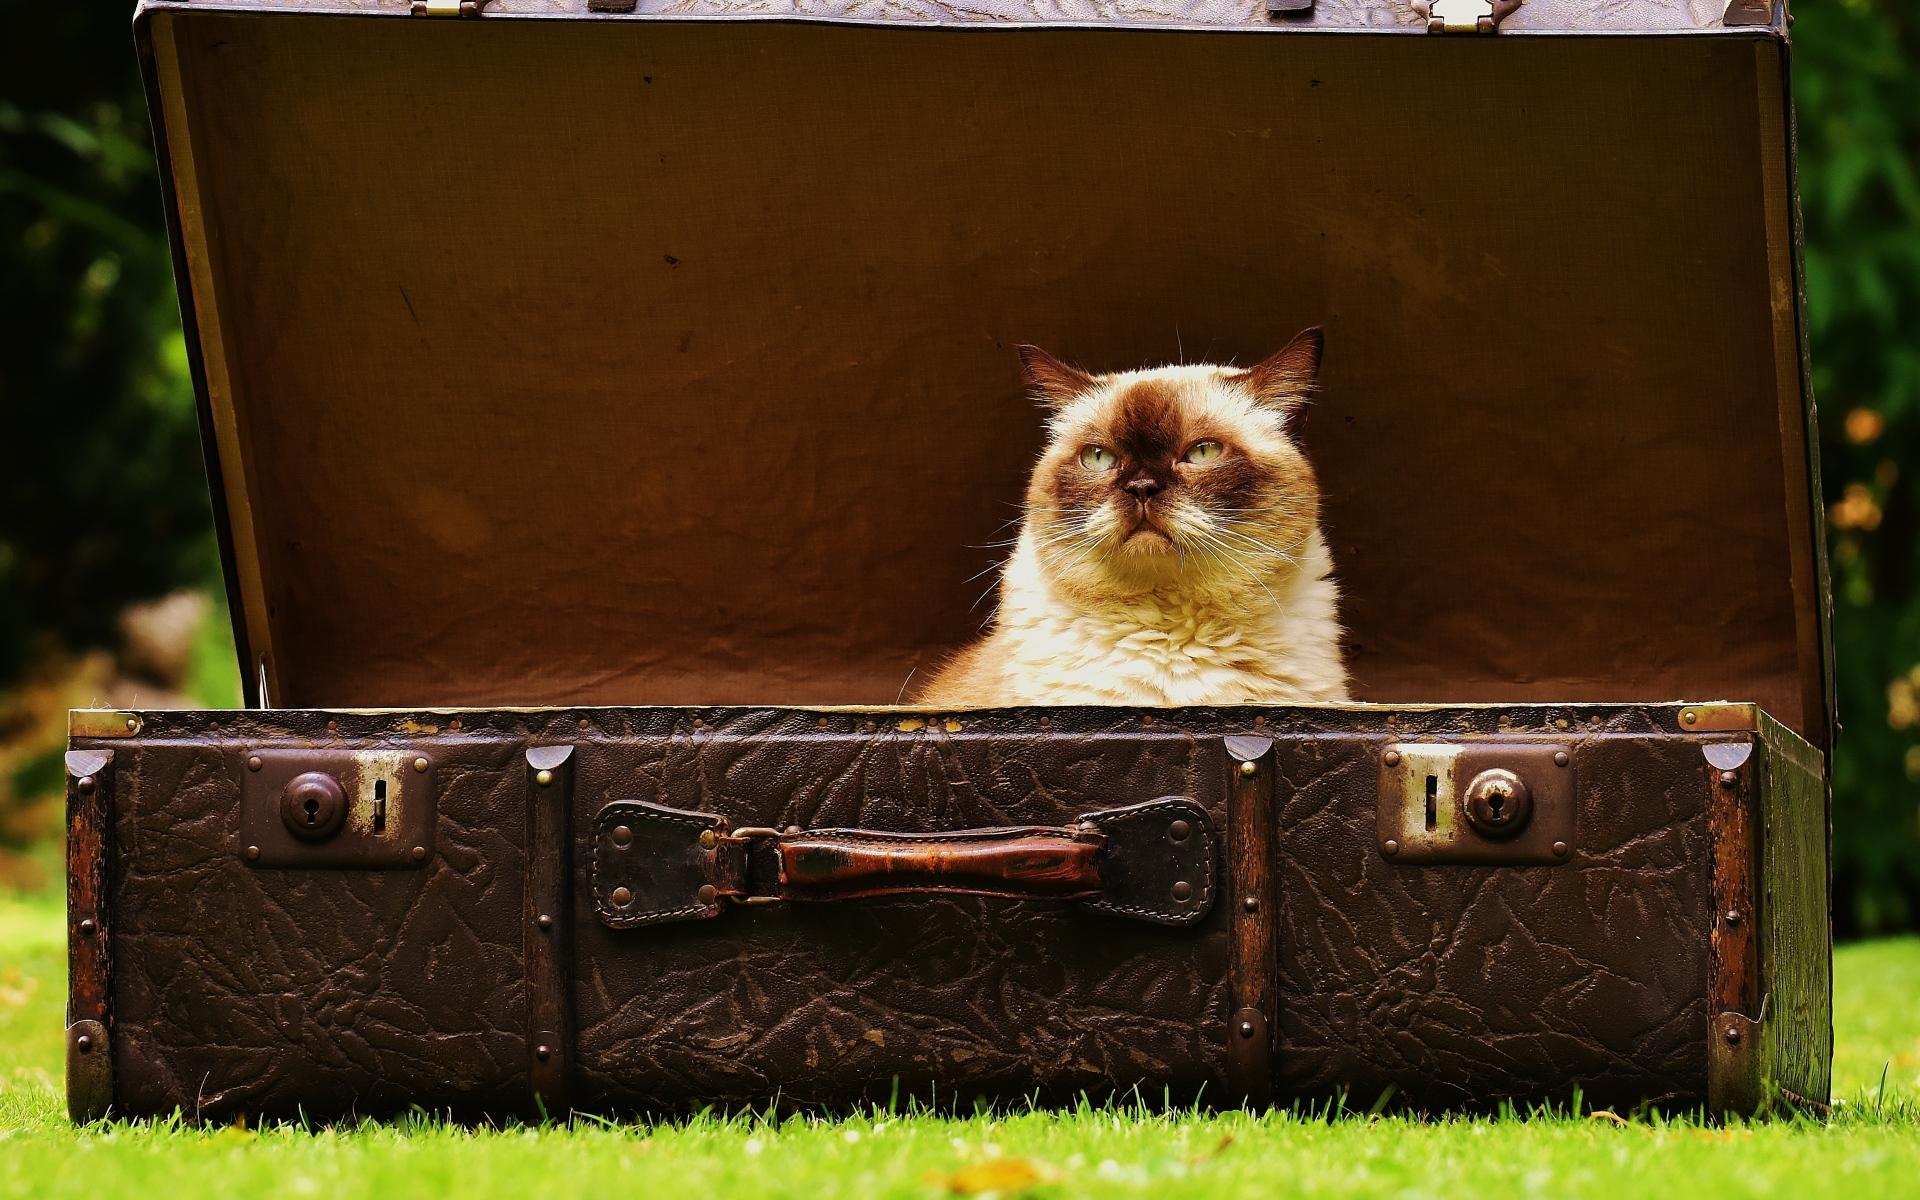 Картинки Кошка, чемодан, антиквариат фото и обои на рабочий стол